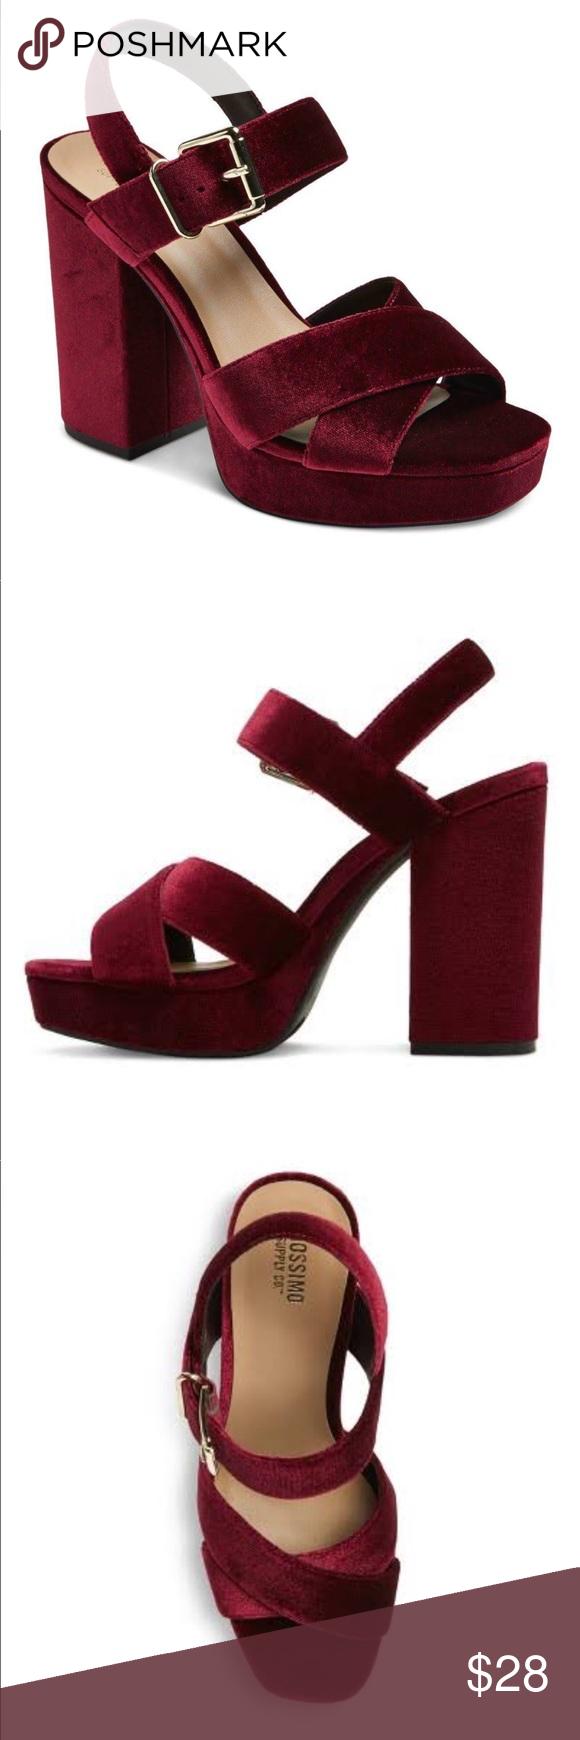 2c049d29f02 Mossimo Burgundy heels Alexandra burgundy velvet tall platform heel pumps.  Wide thick heel with ankle strap and an open toe. Criss-cross strap design.